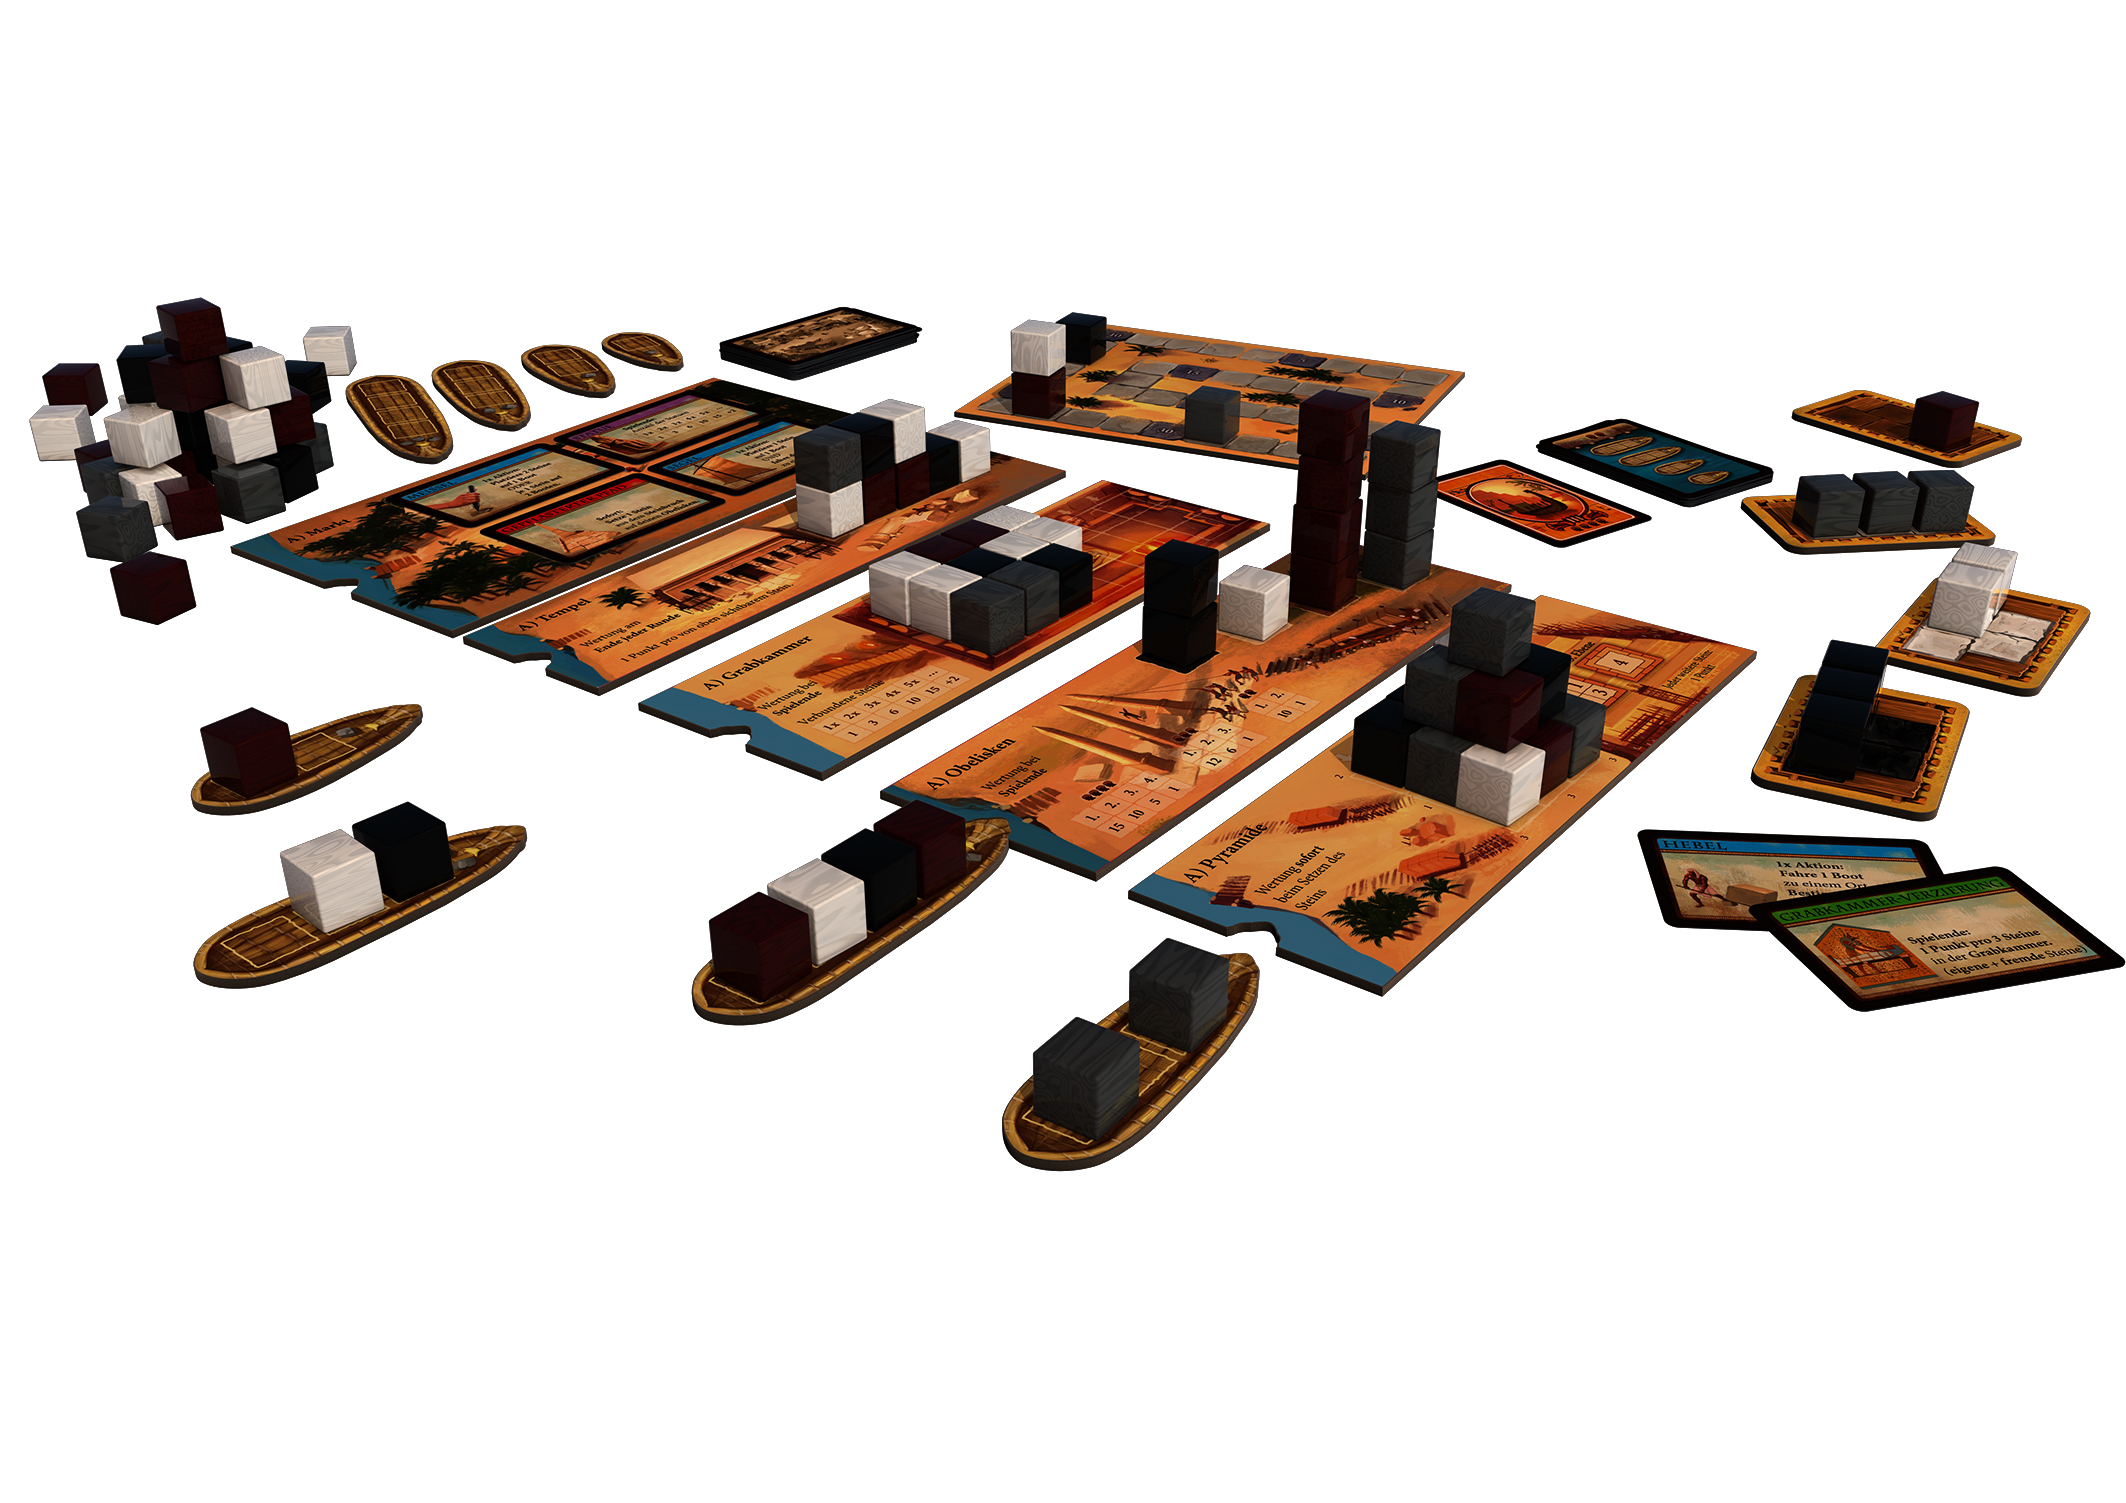 Imhotep - Arhitectul Egiptului Antic | Kosmos